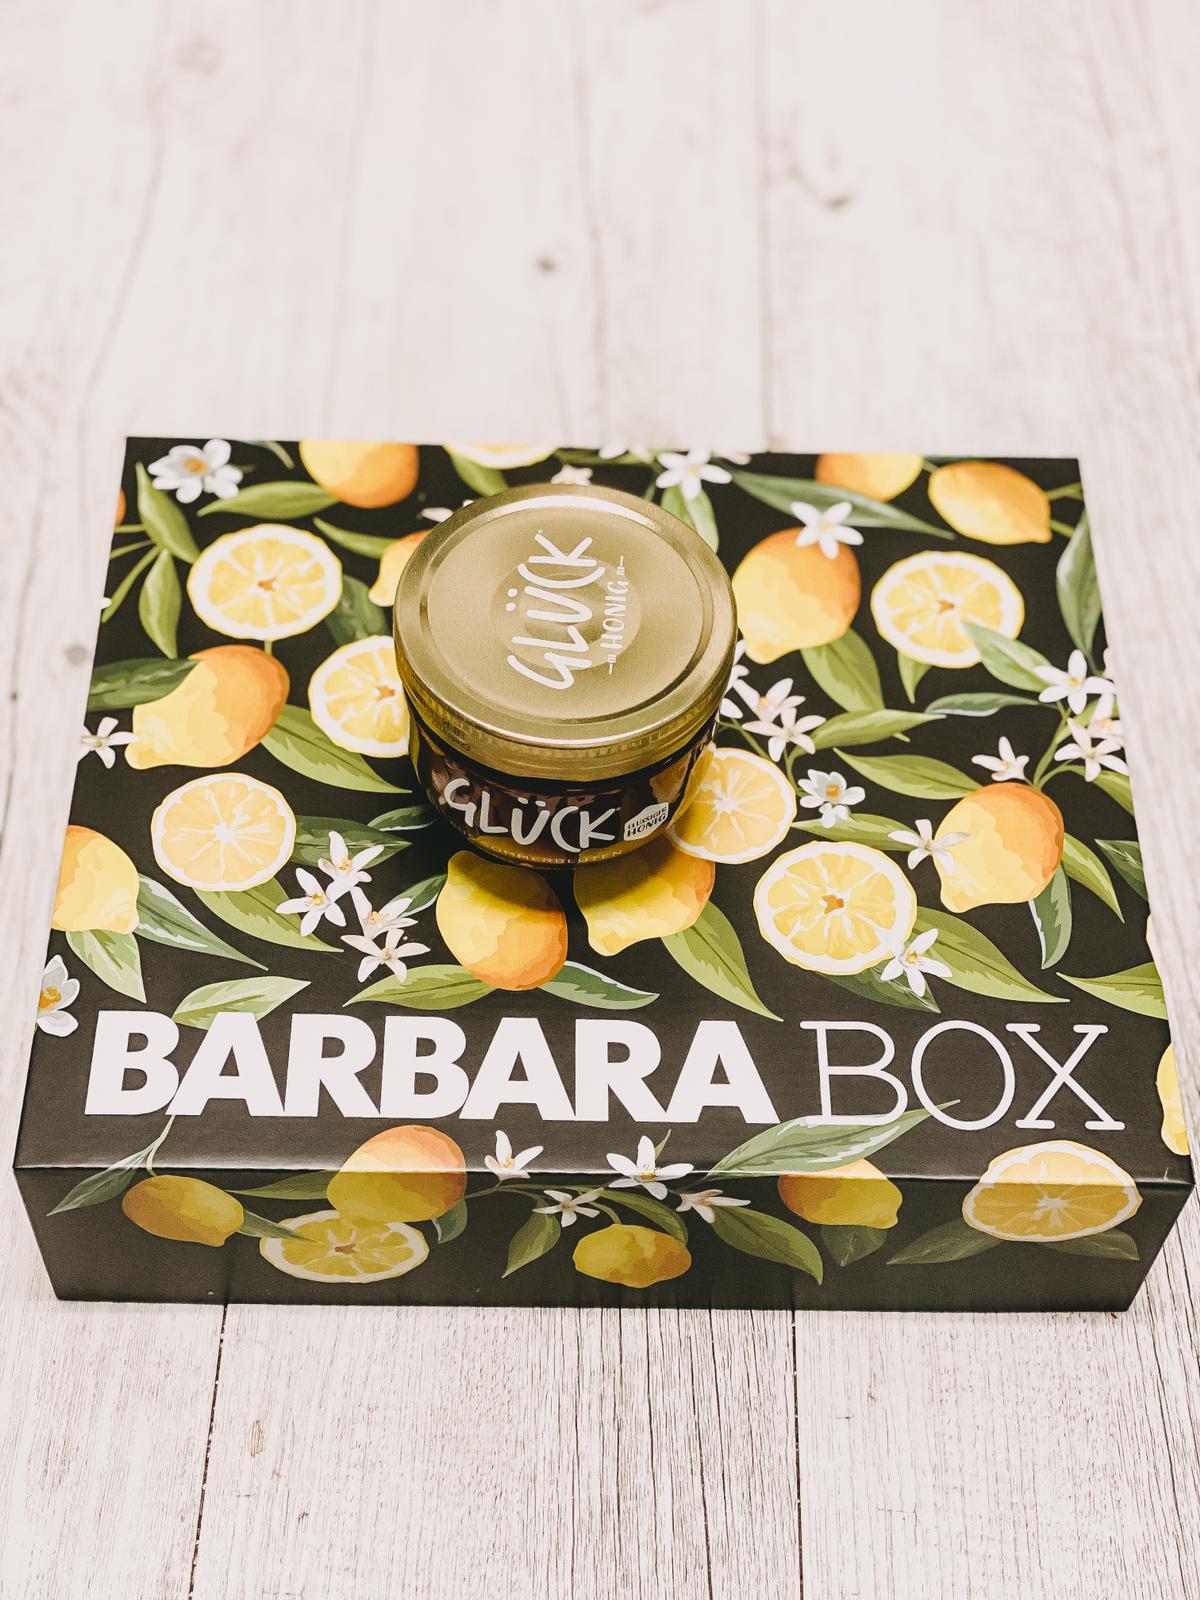 Barbara Box La Dolce Vita Glück Honig